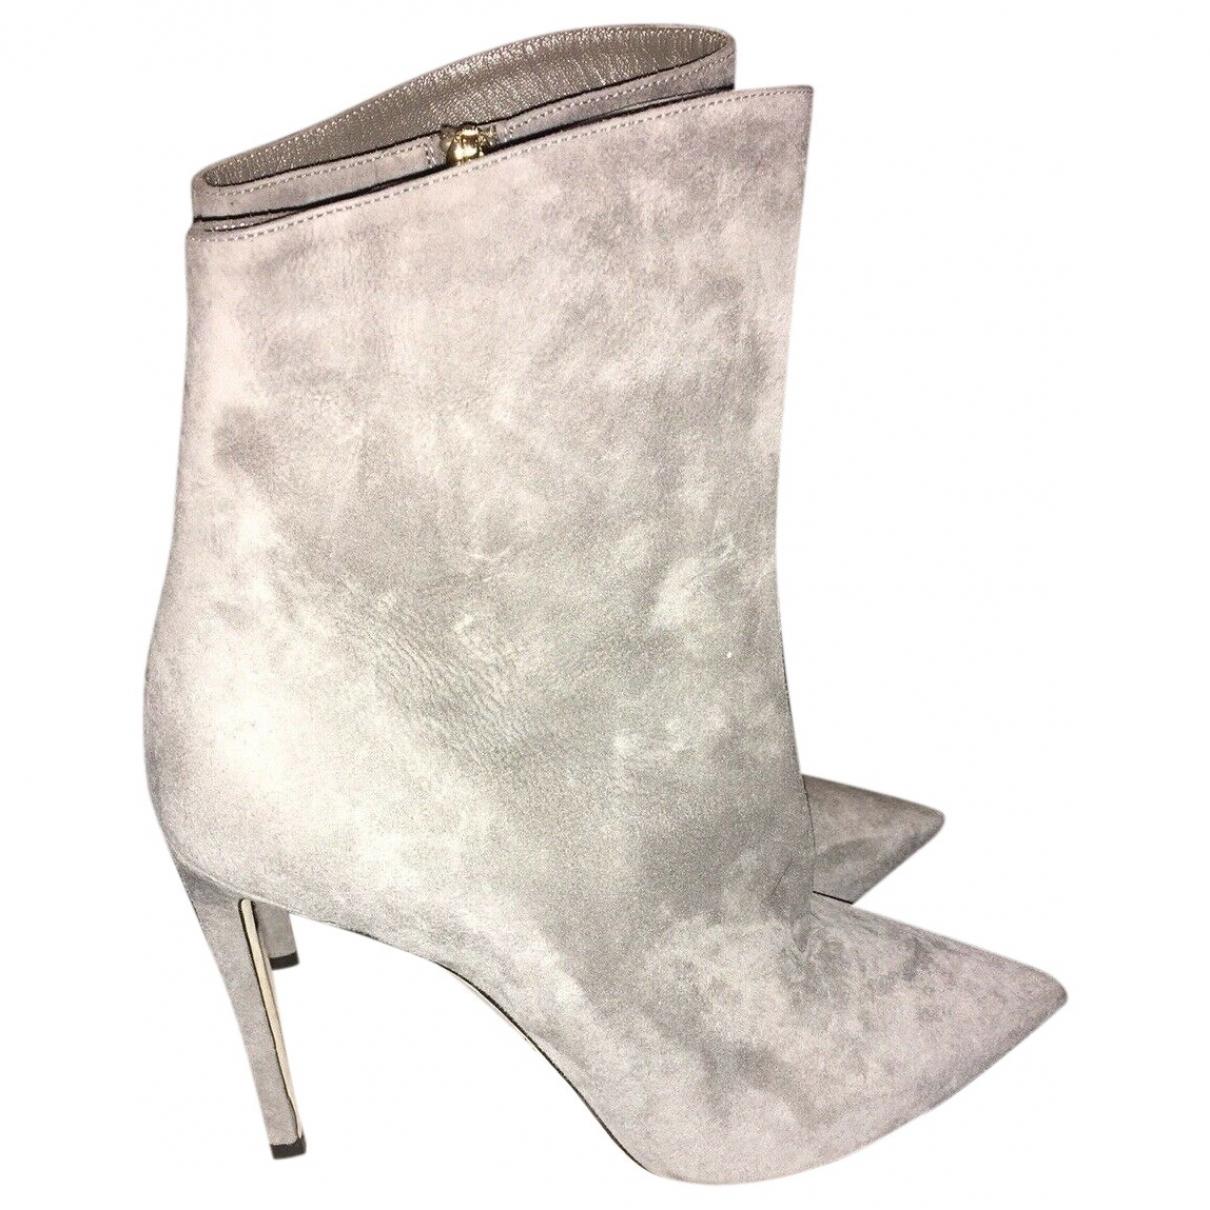 Jimmy Choo \N Grey Suede Boots for Women 40 EU